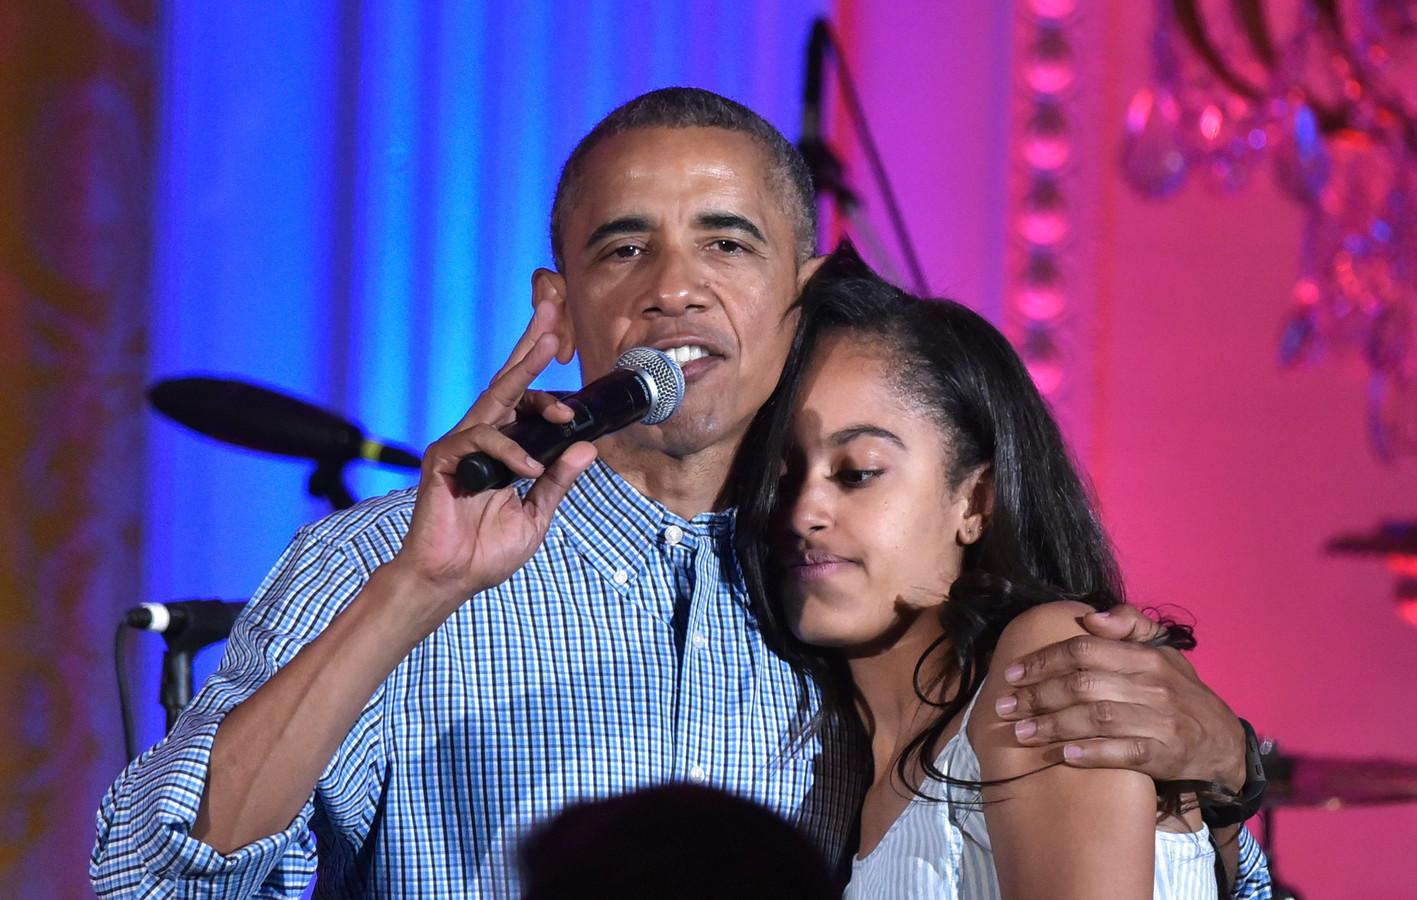 Barack en Malia Obama op 4 juli 2016.